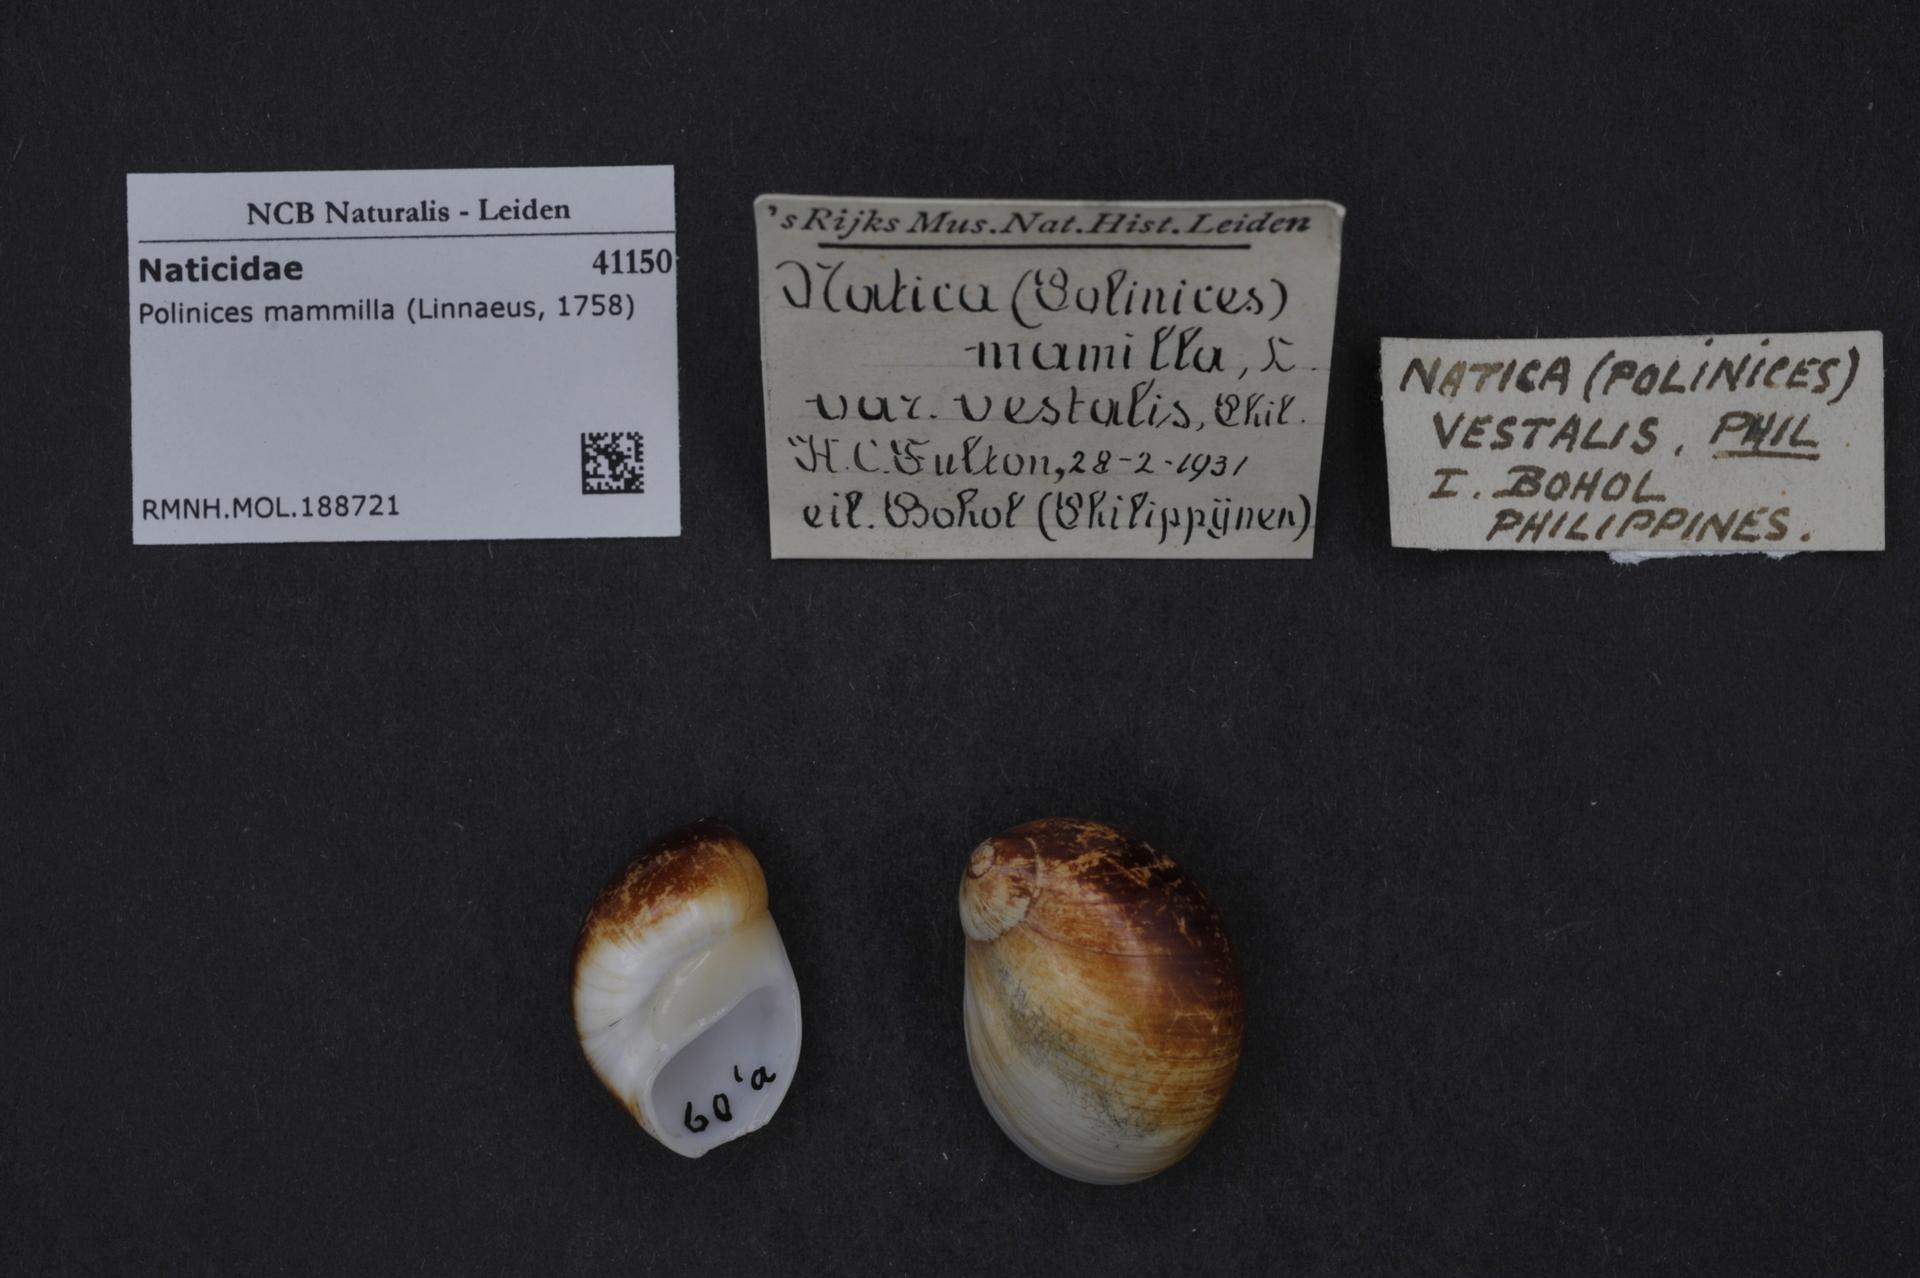 RMNH.MOL.188721 | Polinices mammilla (Linnaeus, 1758)